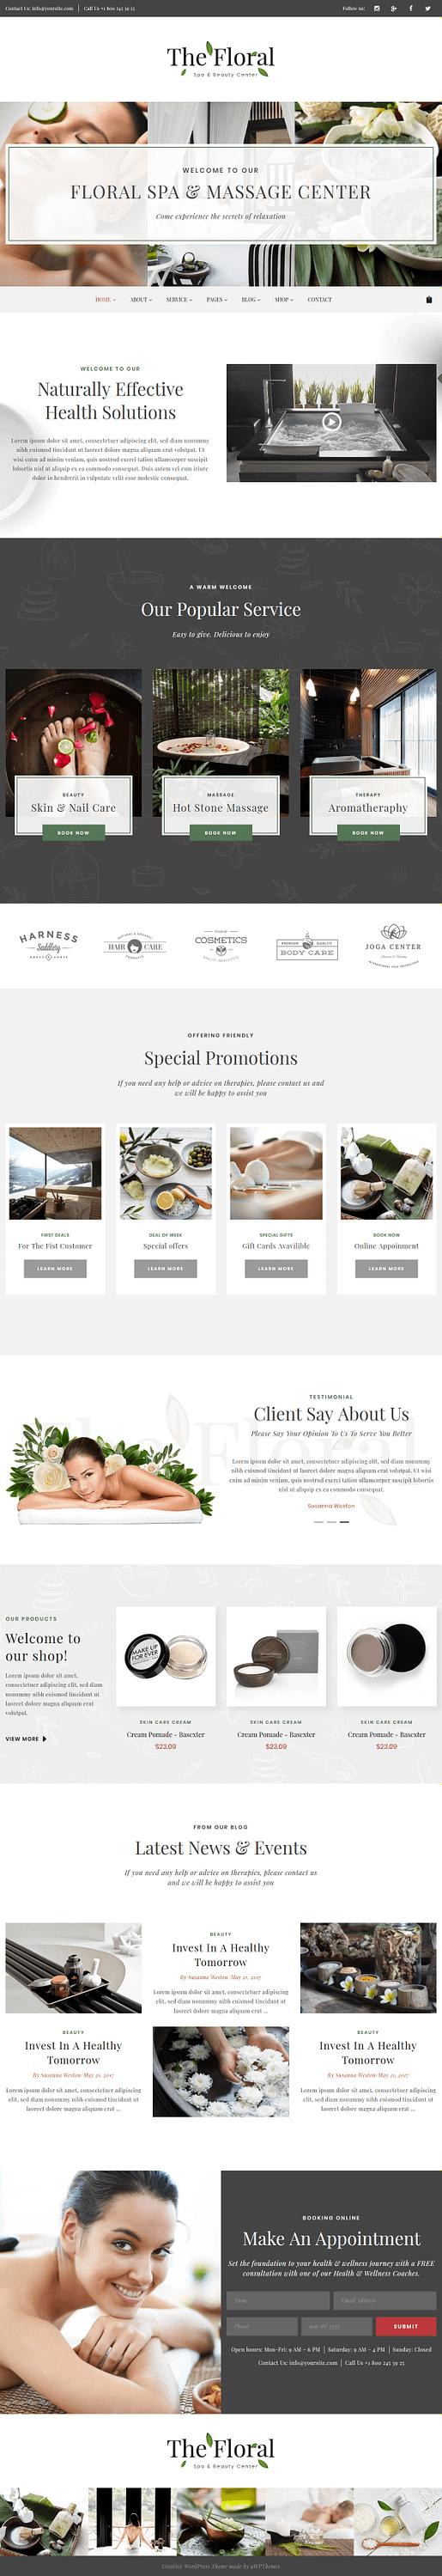 floral best premium spa beauty wordpress theme - 10+ Best Premium Spa and Beauty WordPress Themes